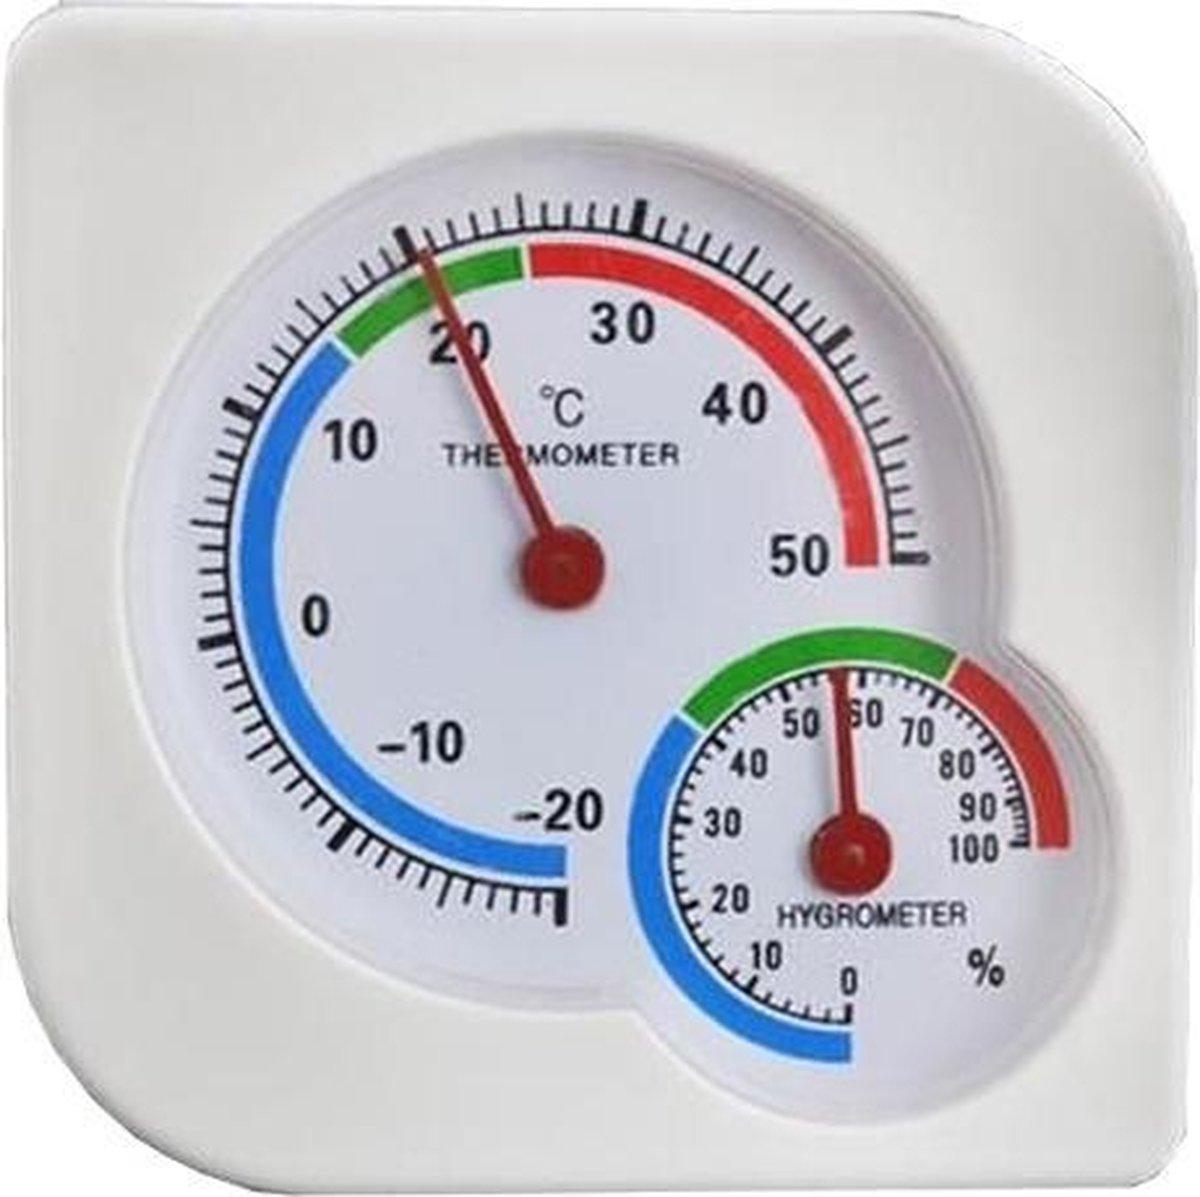 Thermometer/Hygrometer Analoog - Analoog Thermometer en Hygrometer in 1 - Binnen en Buiten   wit